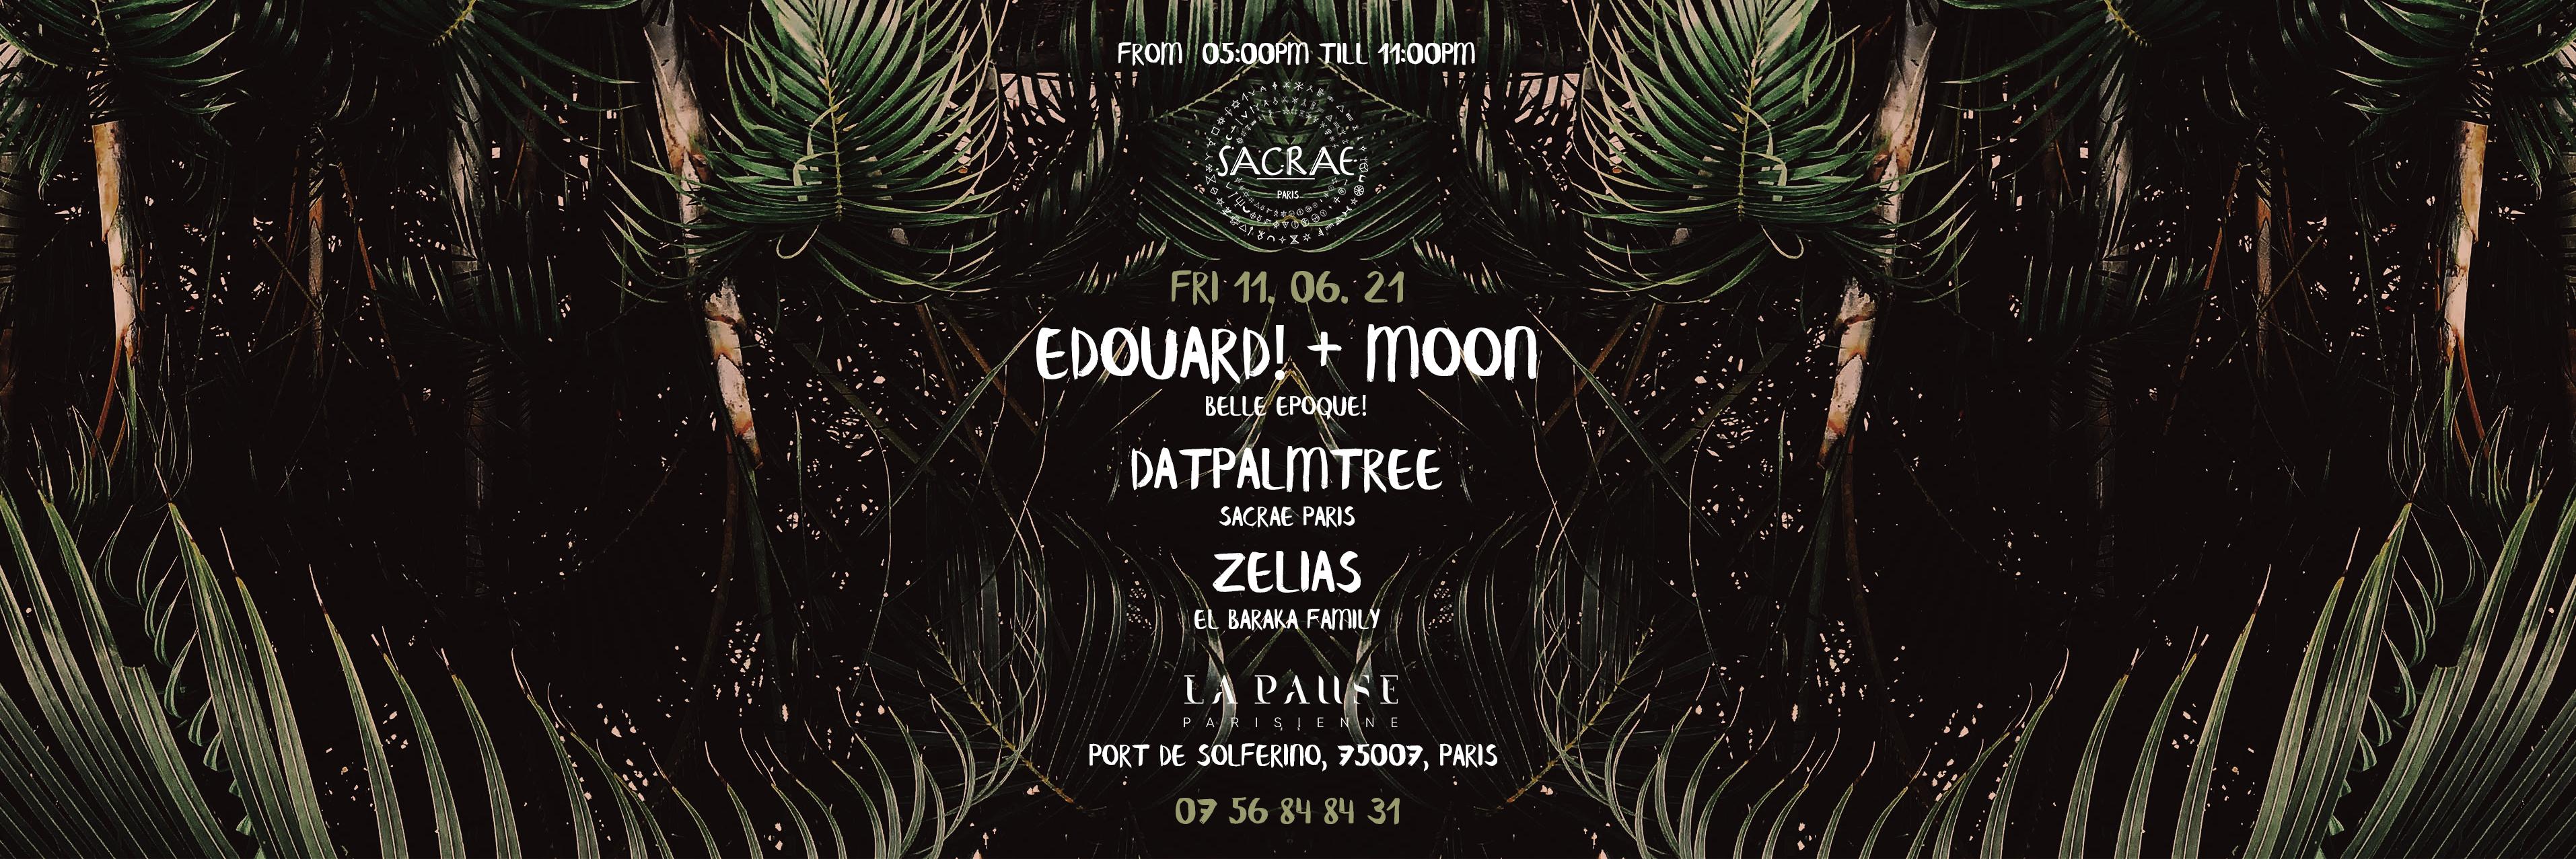 Sacrae Paris x La Pause Parisienne - Act II - Opening night